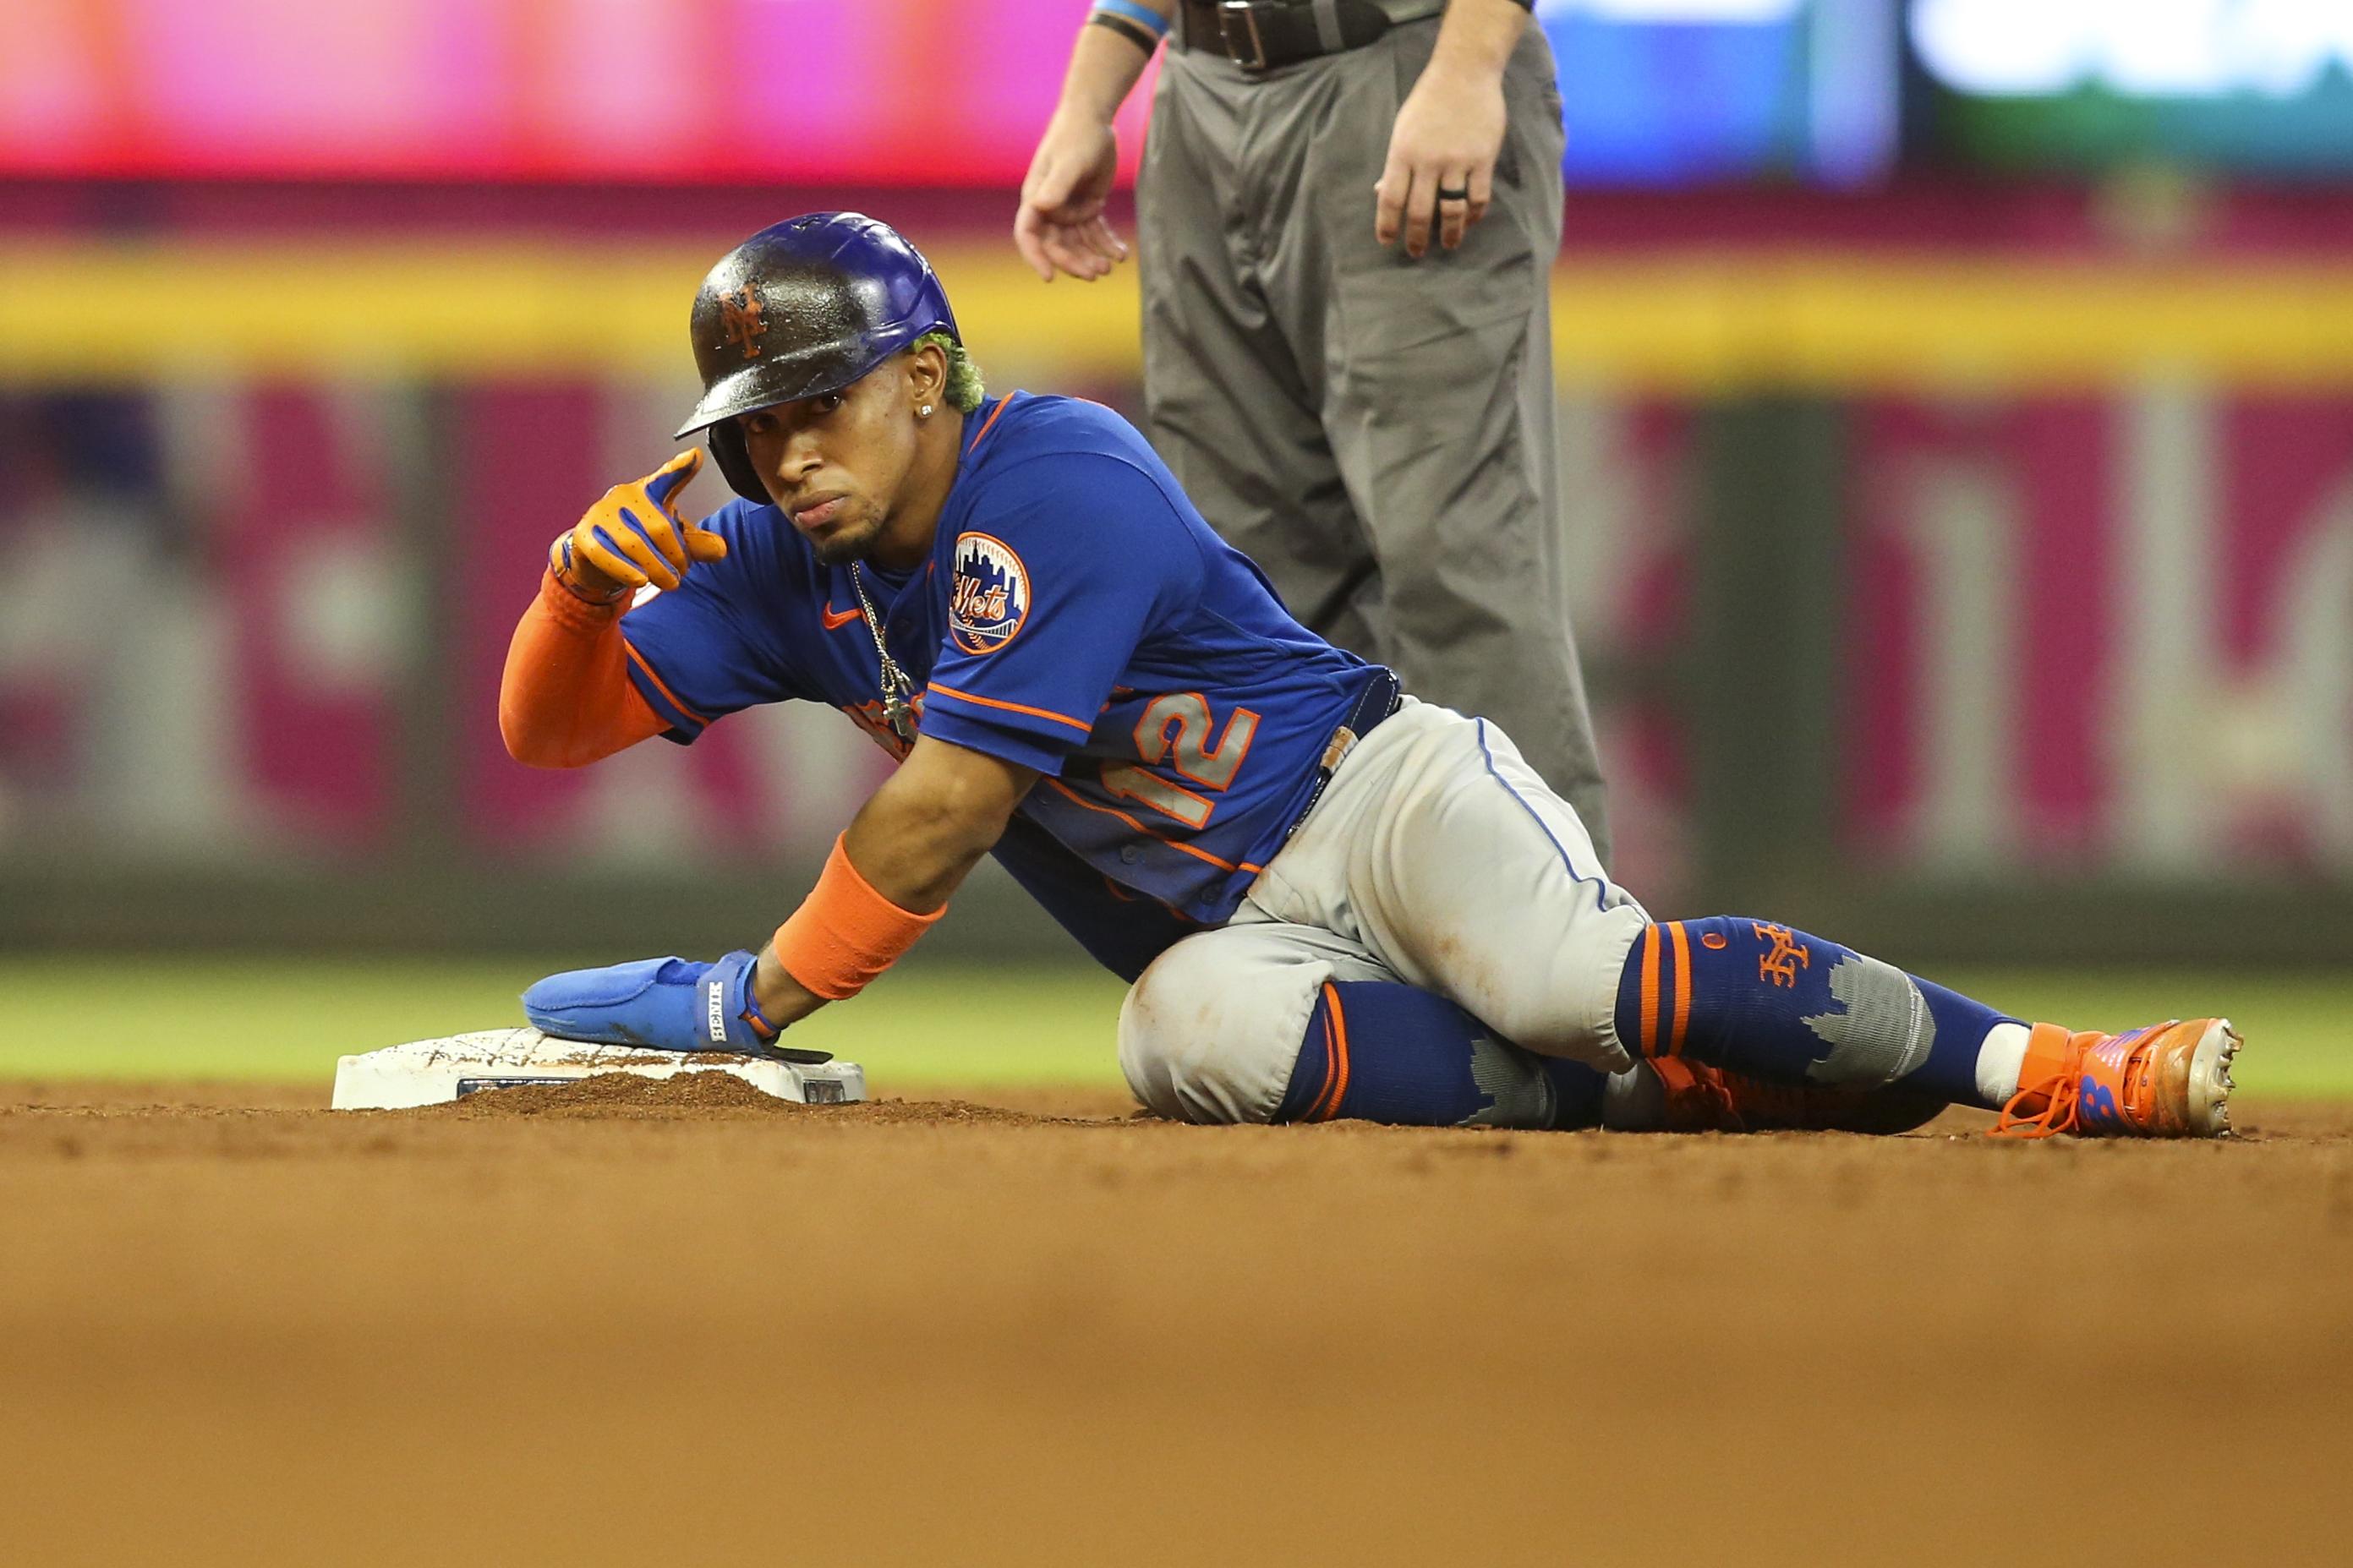 5/18/21 Game Preview: New York Mets at Atlanta Braves